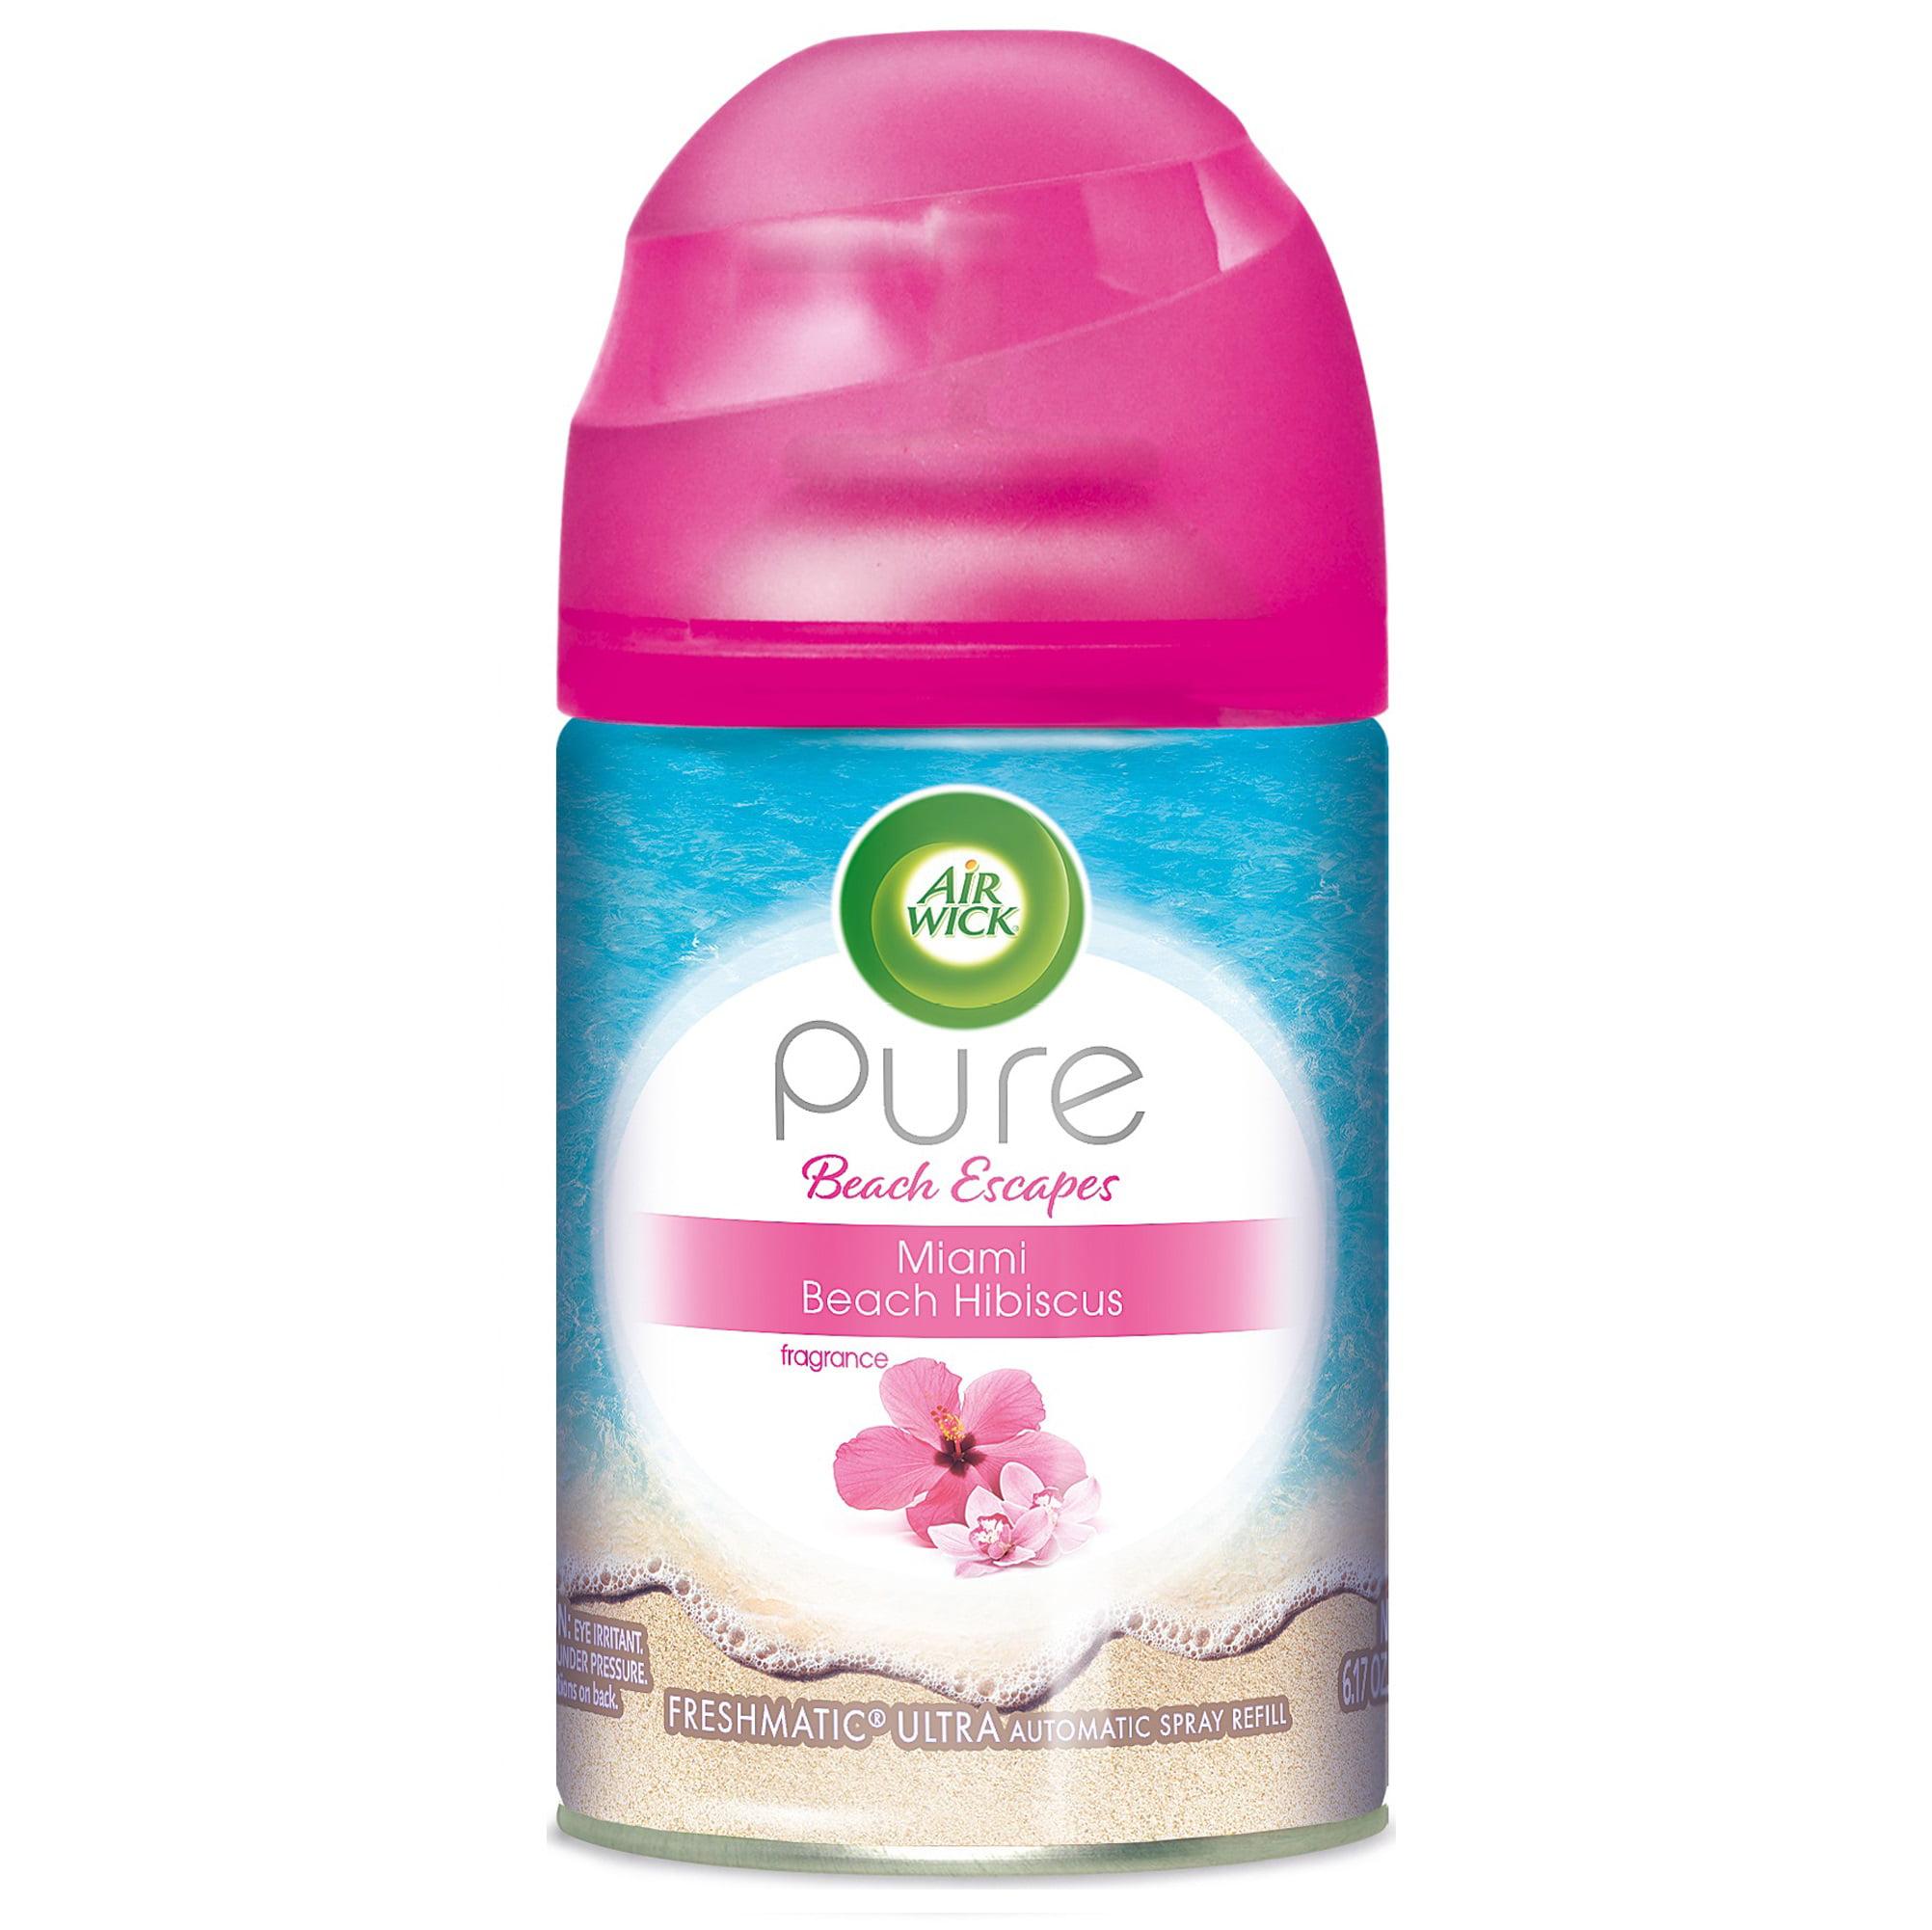 Air Wick Pure Freshmatic Refill Automatic Spray, Miami Beach Hibiscus, 6.17oz, Air Freshener